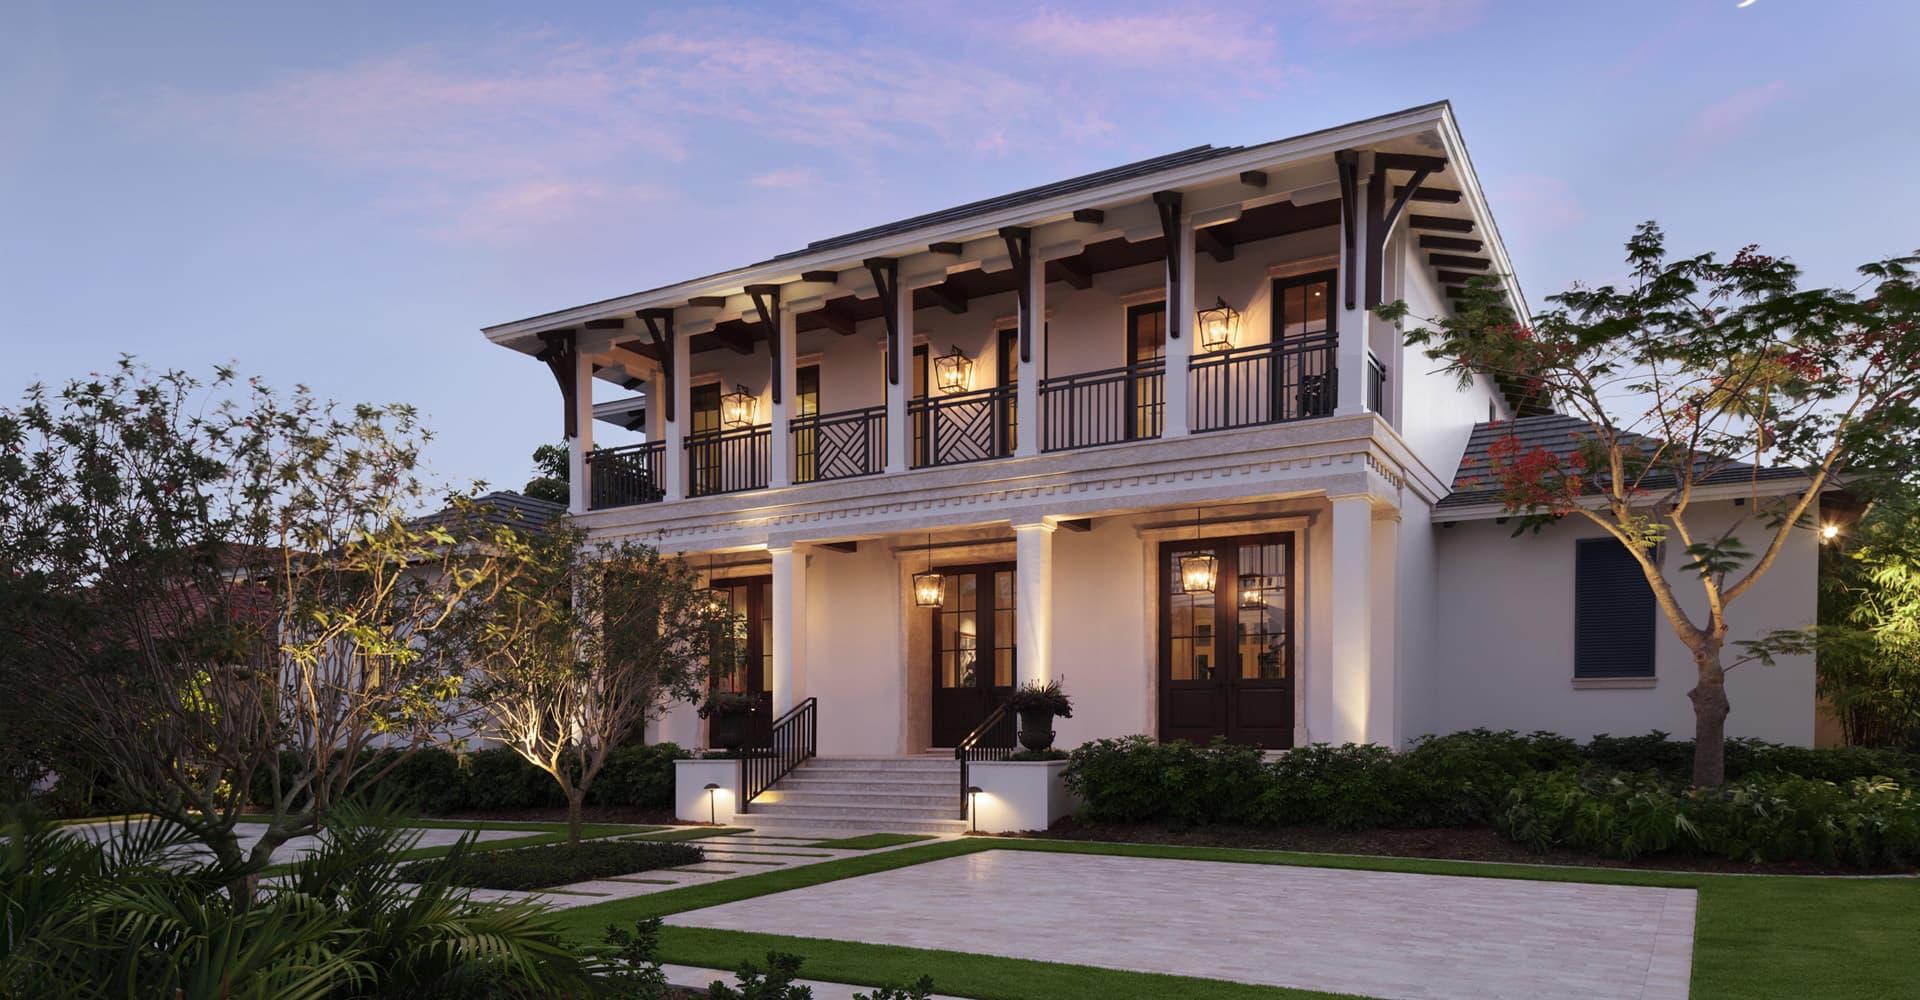 State Street Property Management Florida